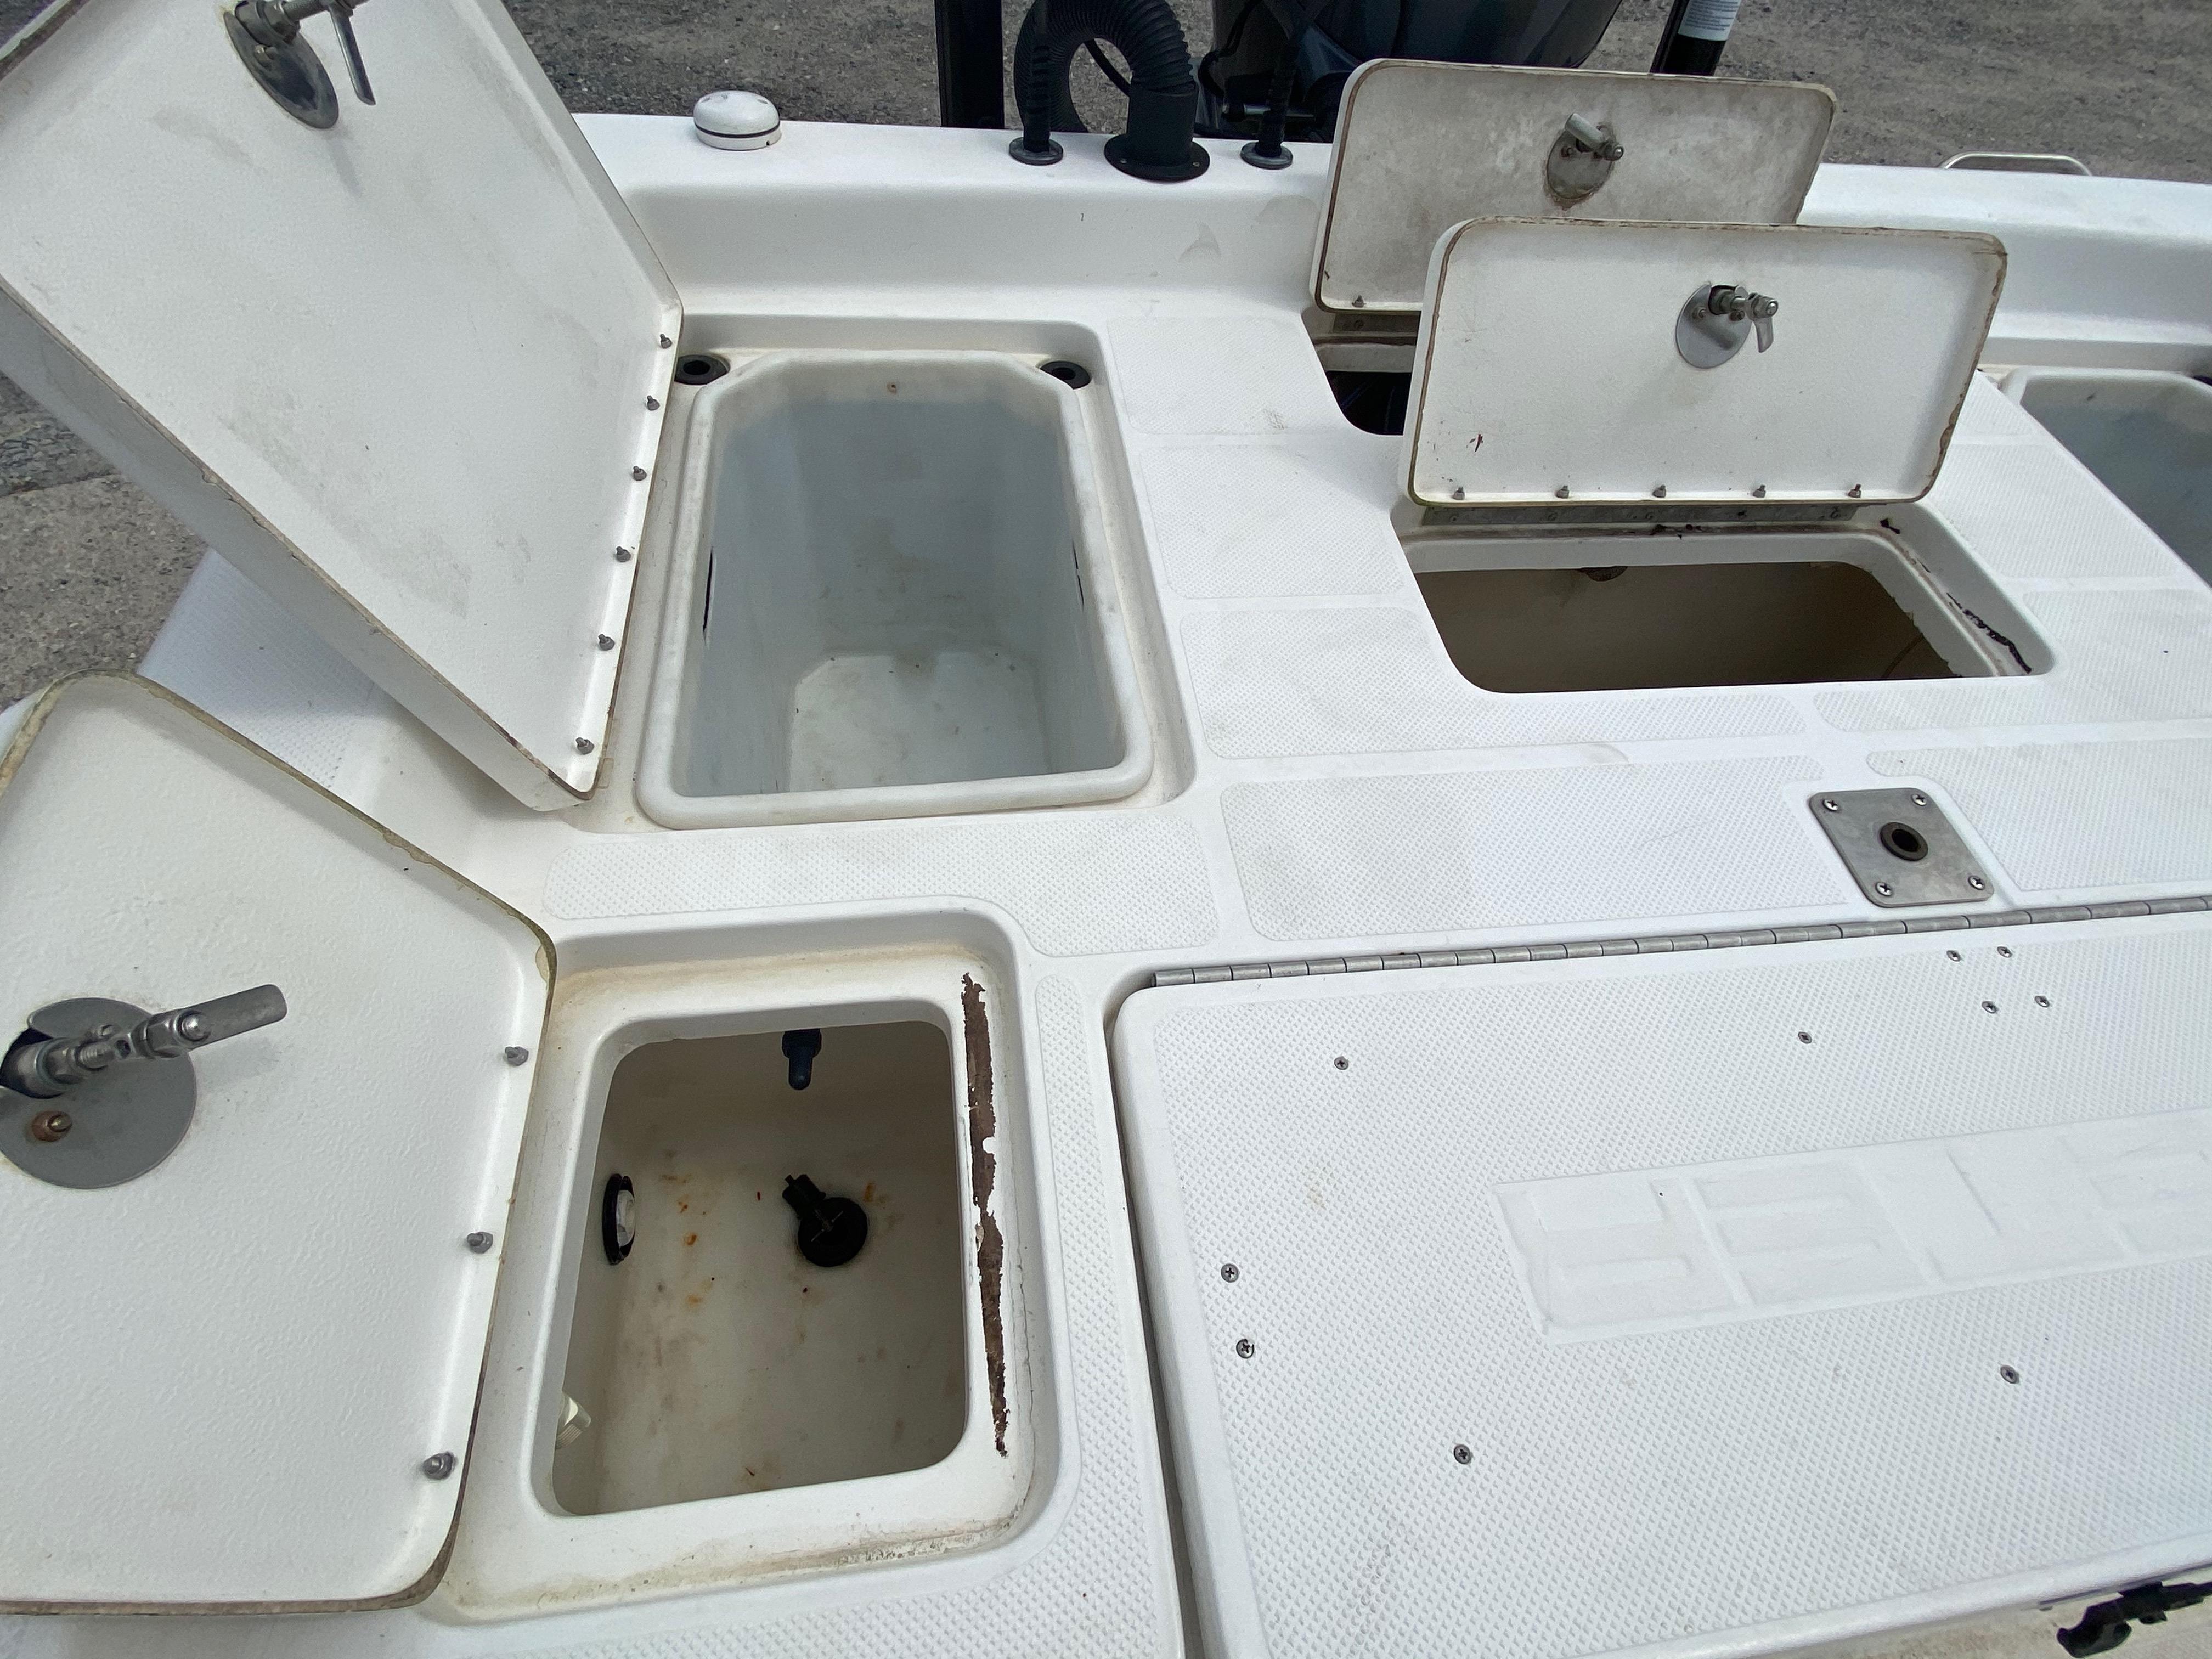 2010 Skeeter boat for sale, model of the boat is ZX 24V & Image # 14 of 18